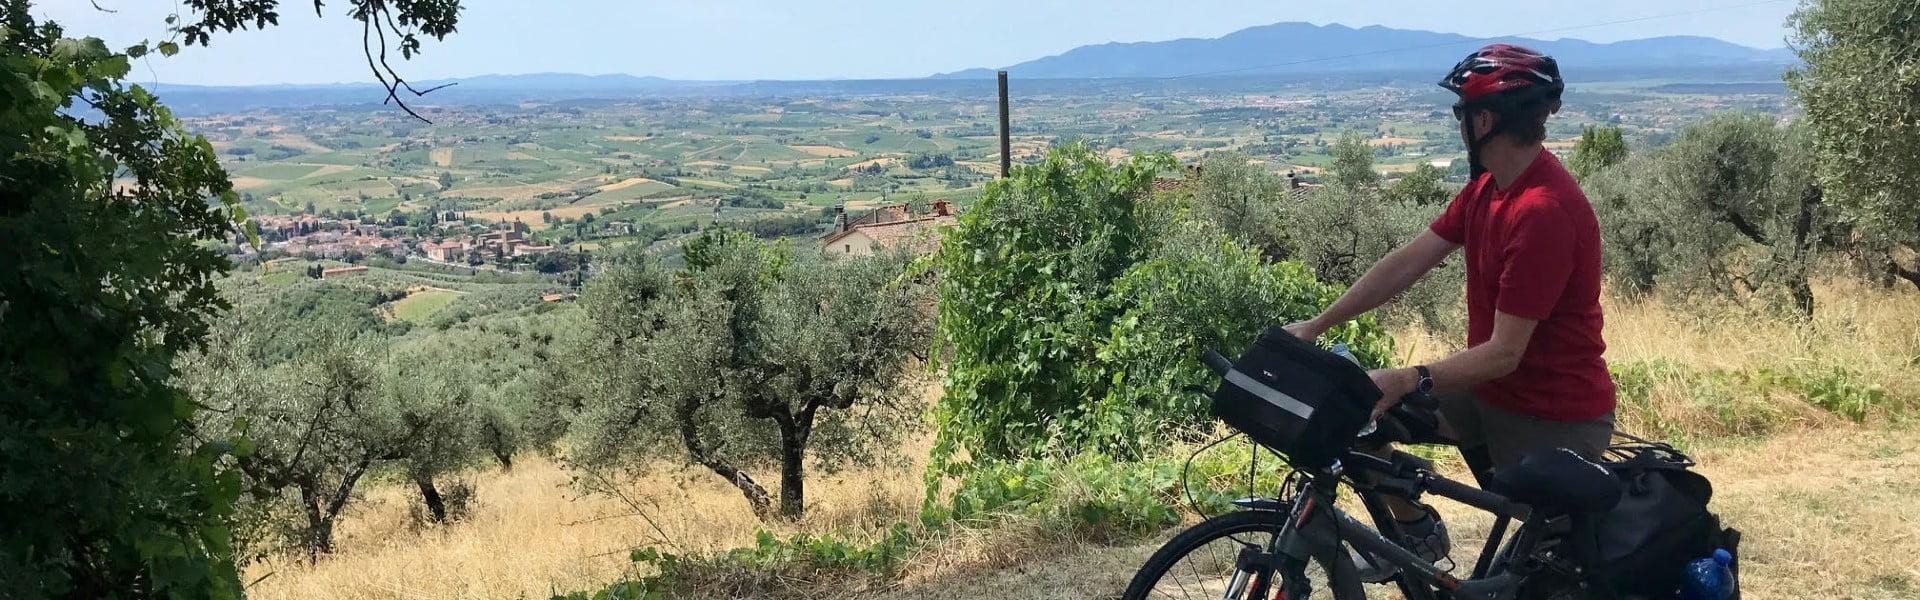 Tuscany Cycle Tour on the way to Vinci